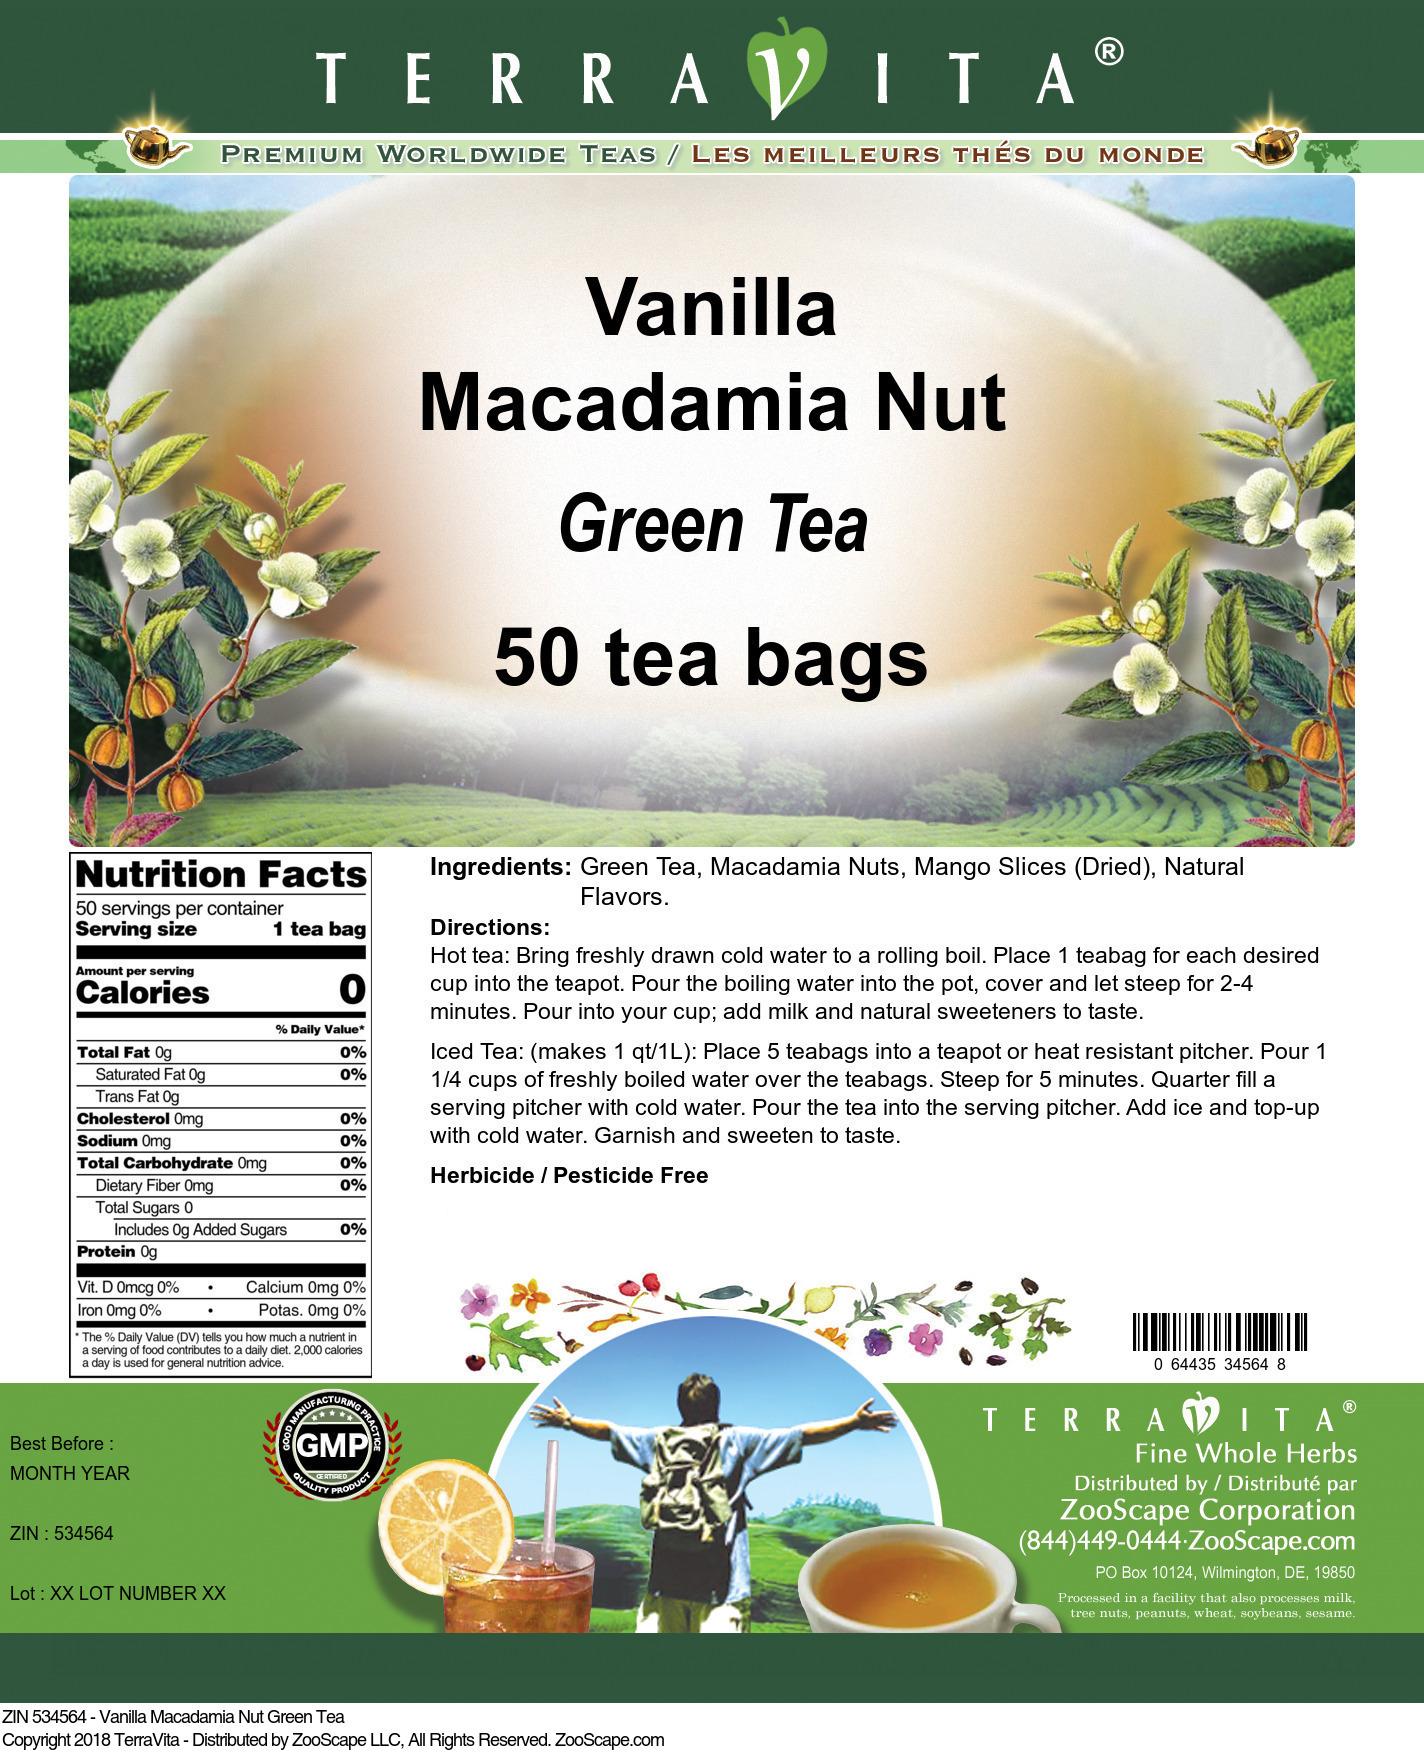 Vanilla Macadamia Nut Green Tea